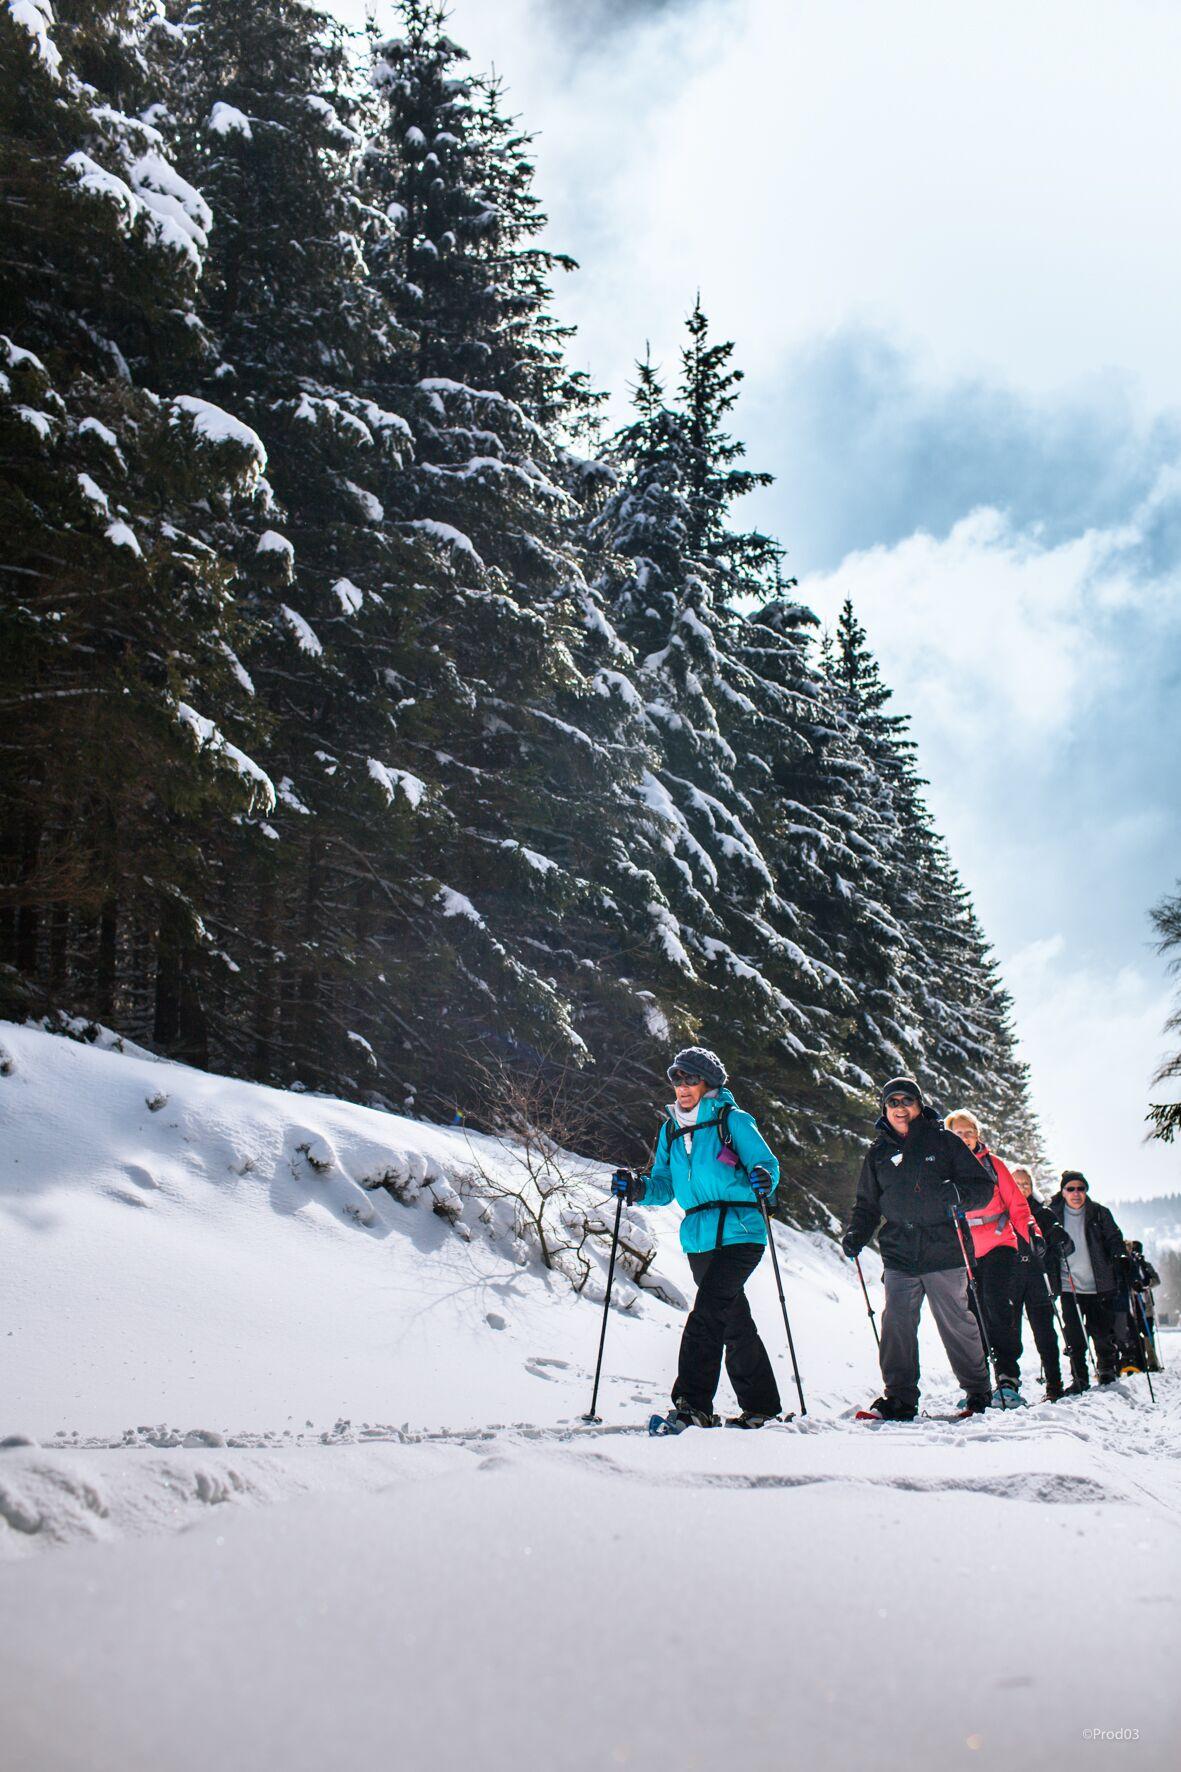 praboure-station-de-ski-hiver-radonnee-ski-de-fond-2